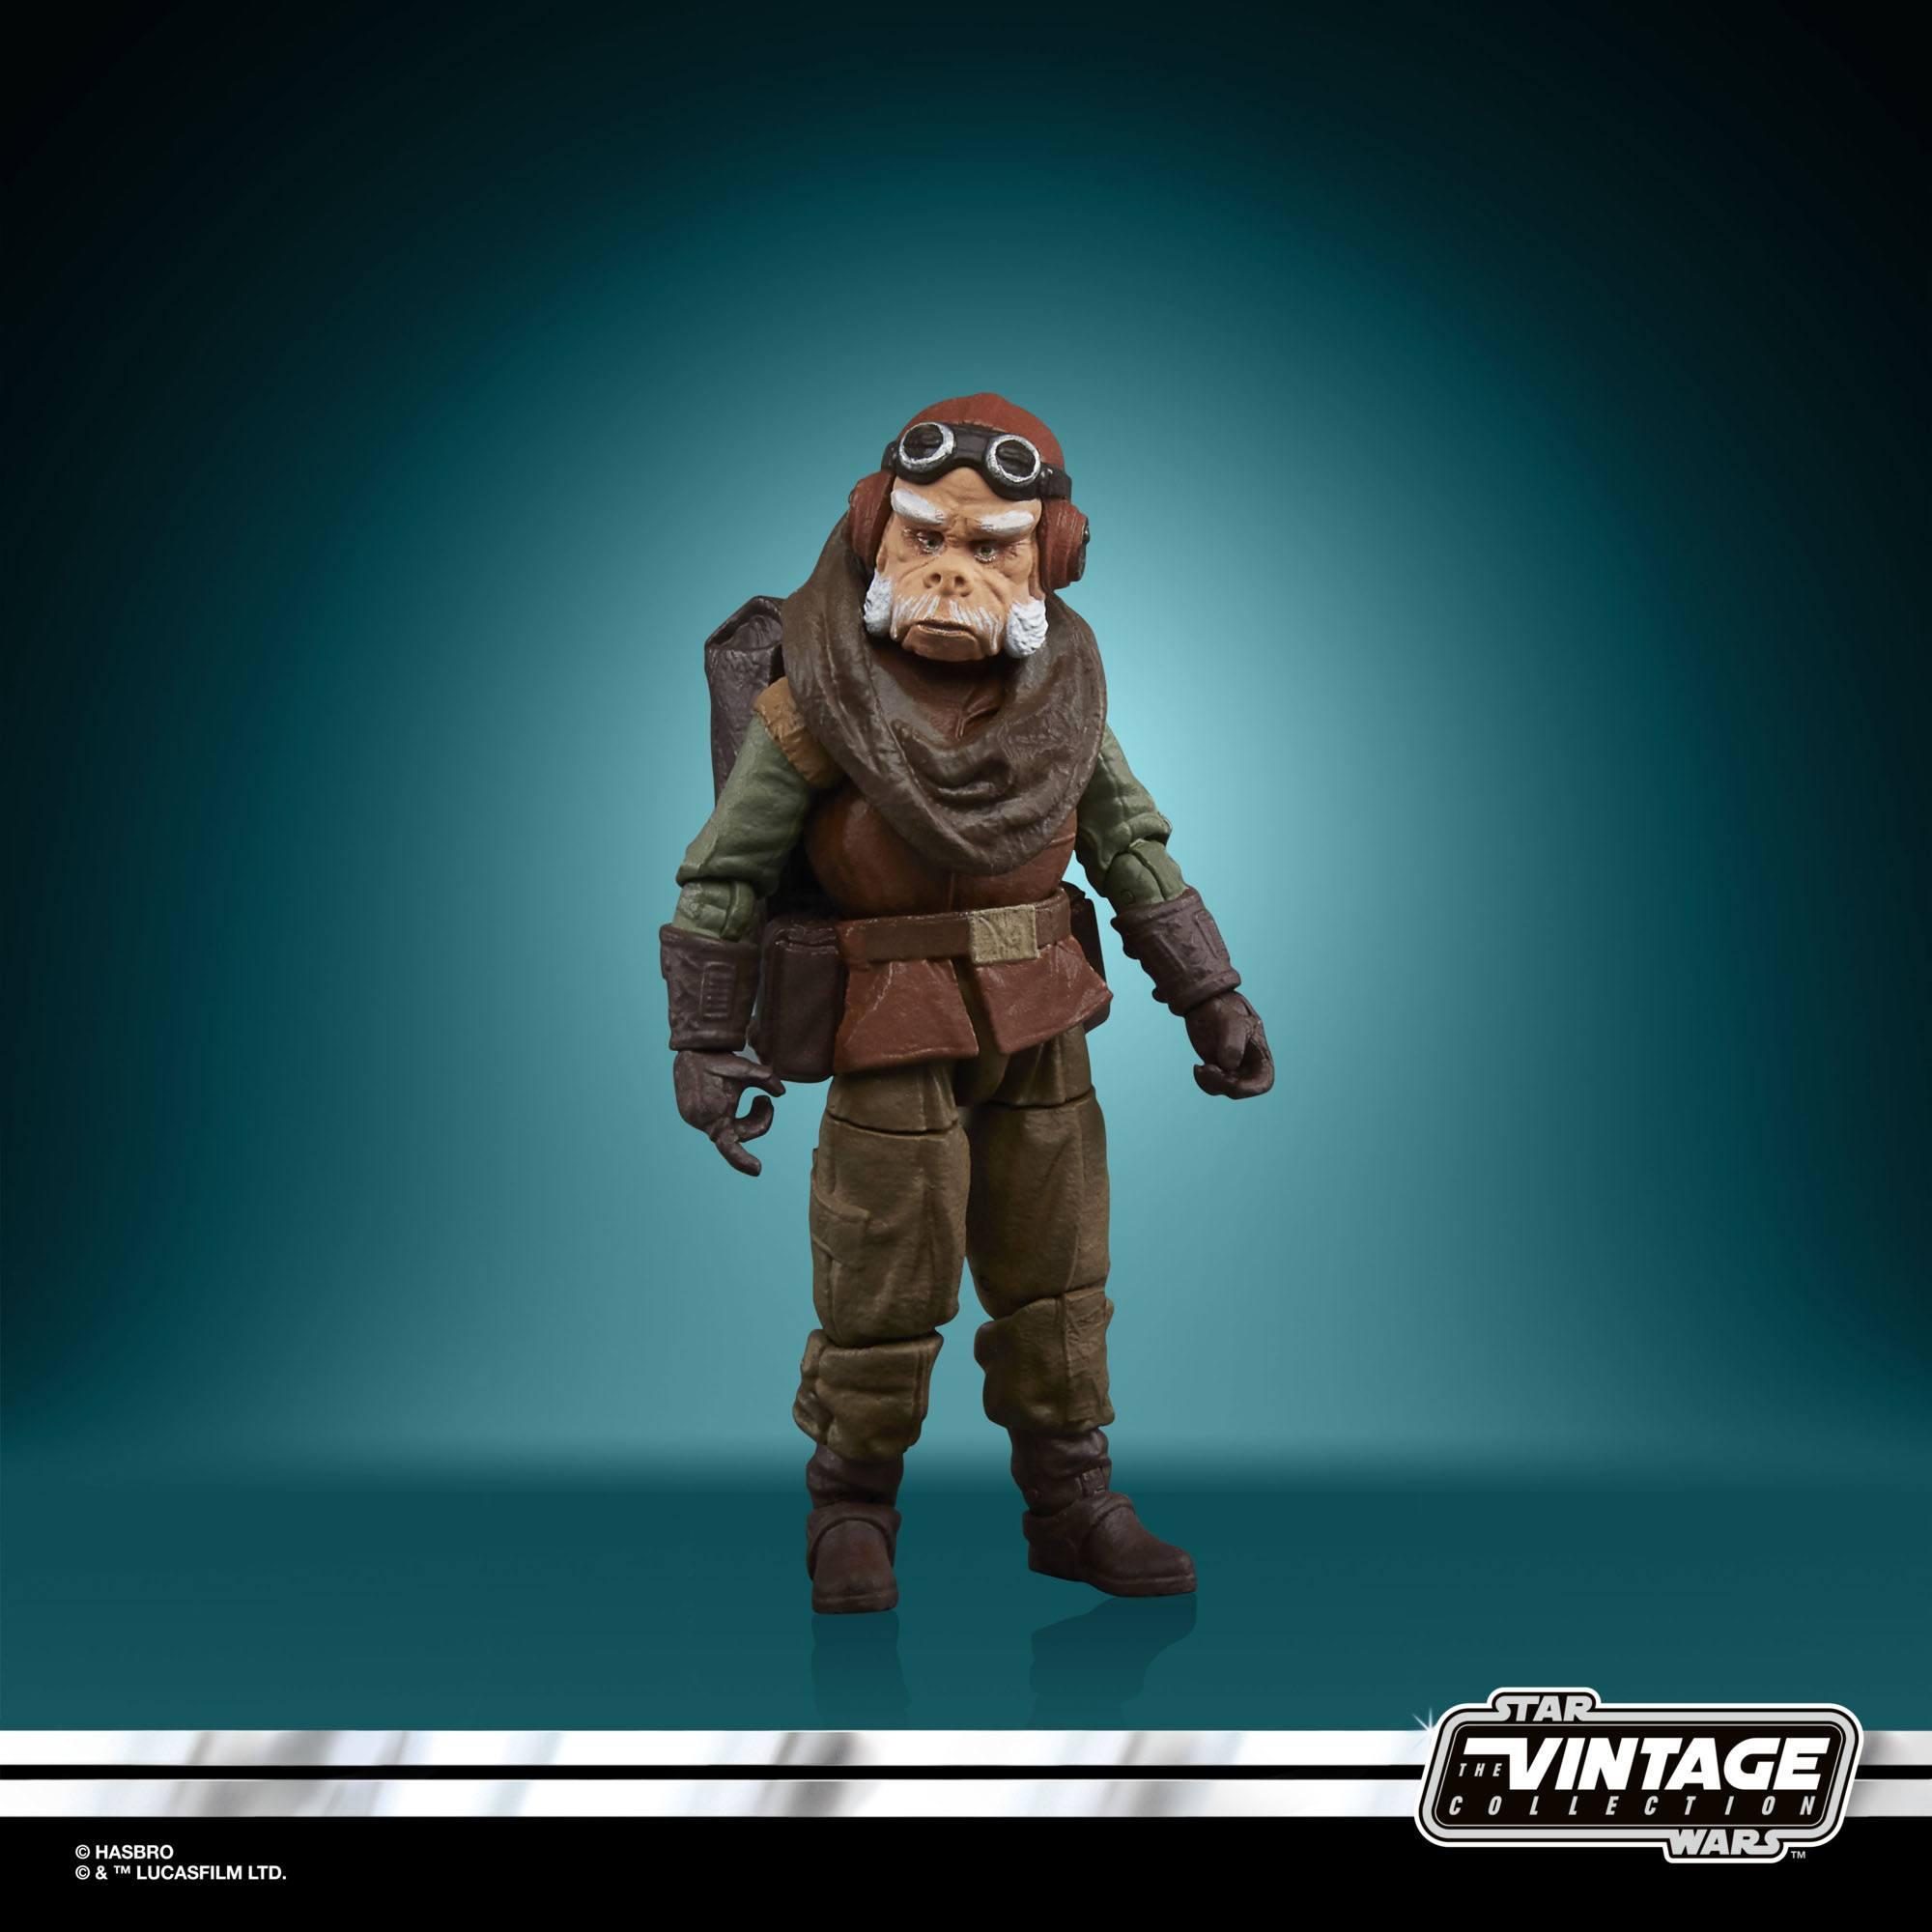 Star Wars The Mandalorian Vintage Collection Actionfigur 2022 Kuiil 10 cm HASF4466 5010993957989